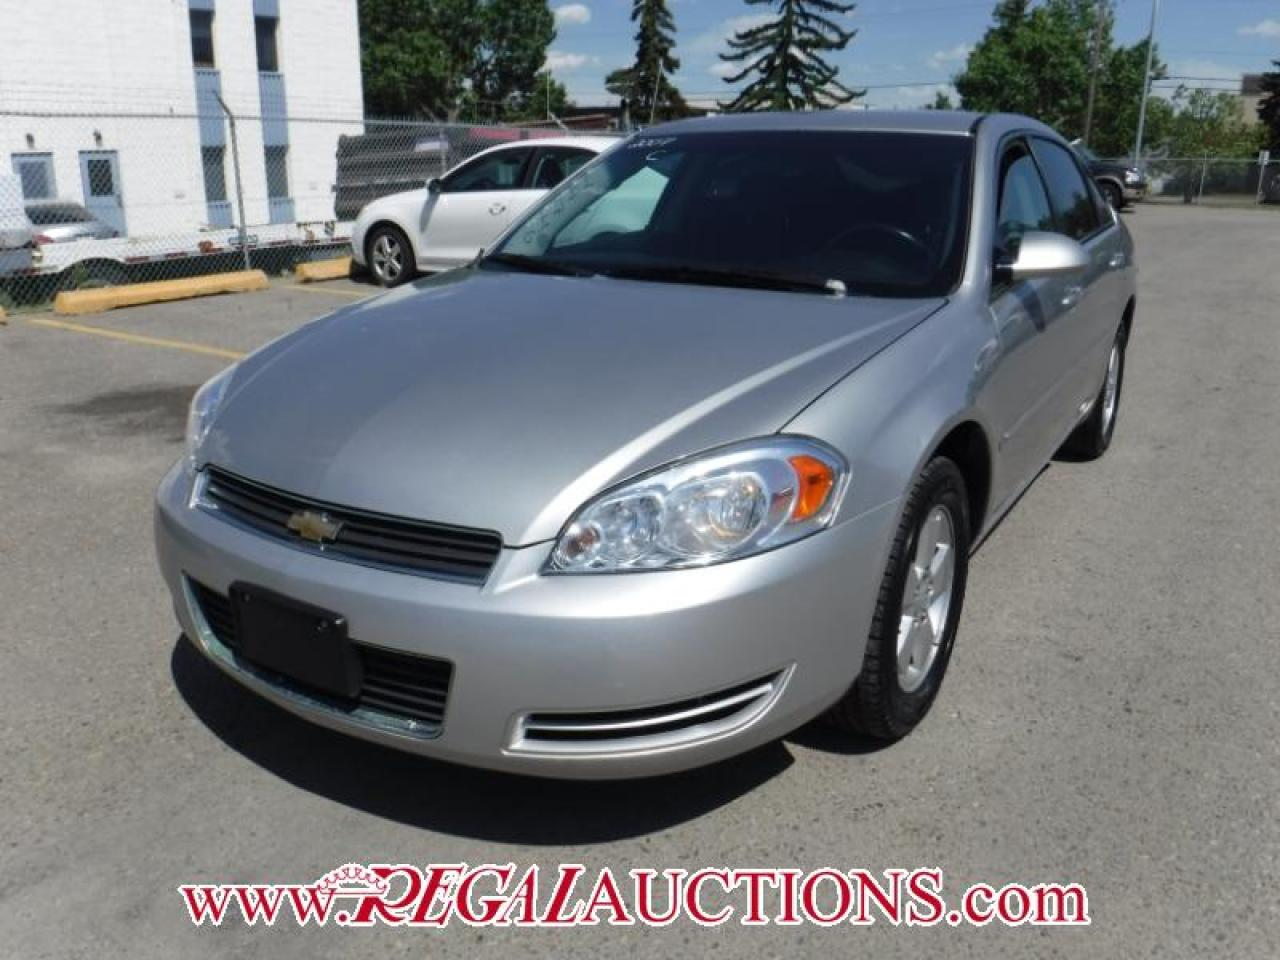 Photo of Silver 2007 Chevrolet IMPALA LT 4D SEDAN